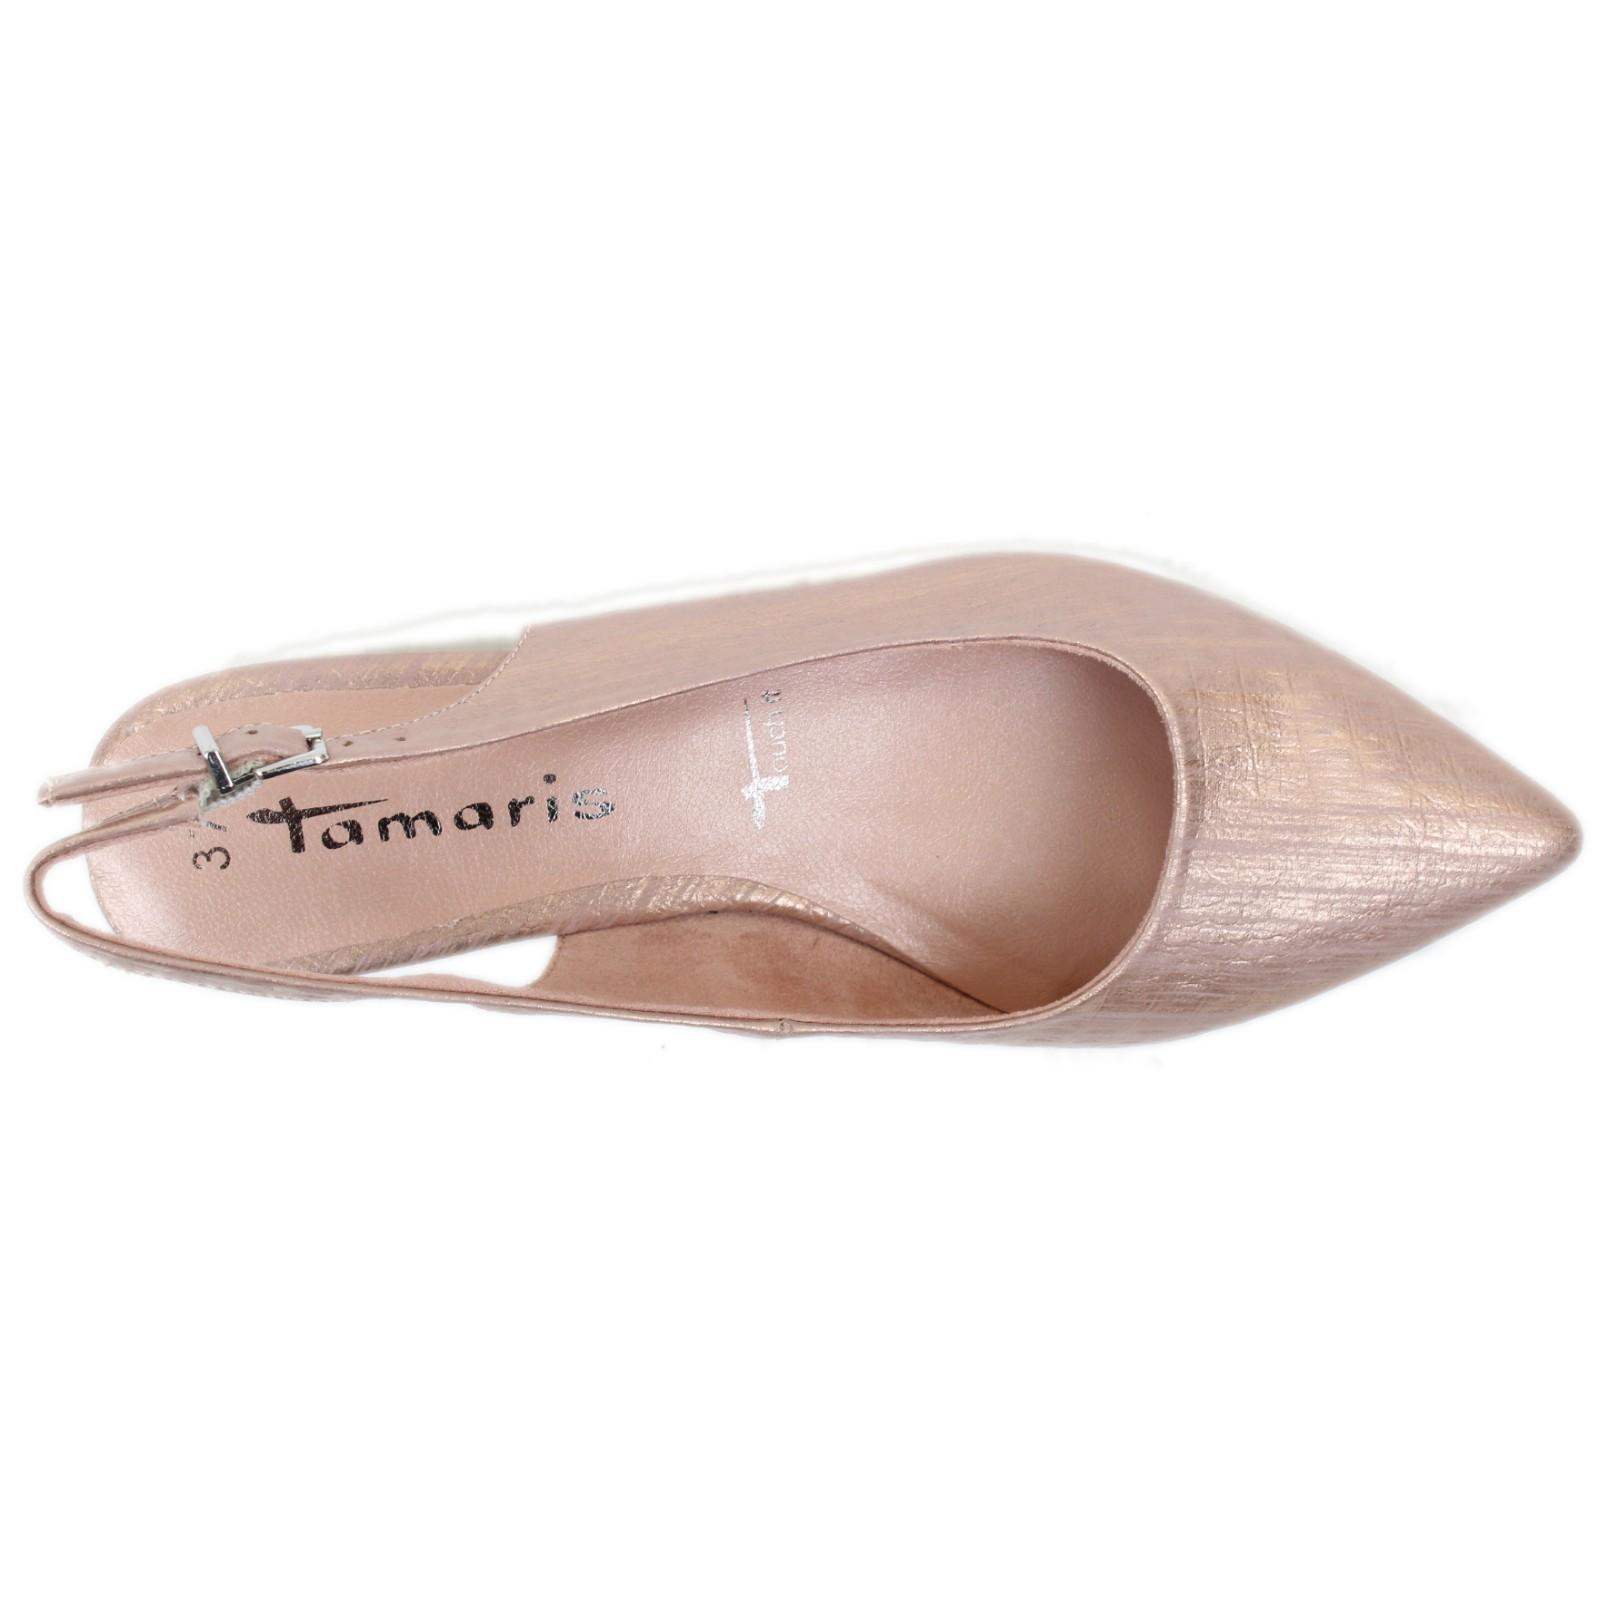 72a3de16ab11 04358 Tamaris női szling 29403-20-537 - Női sling (hátul nyitott cipő)